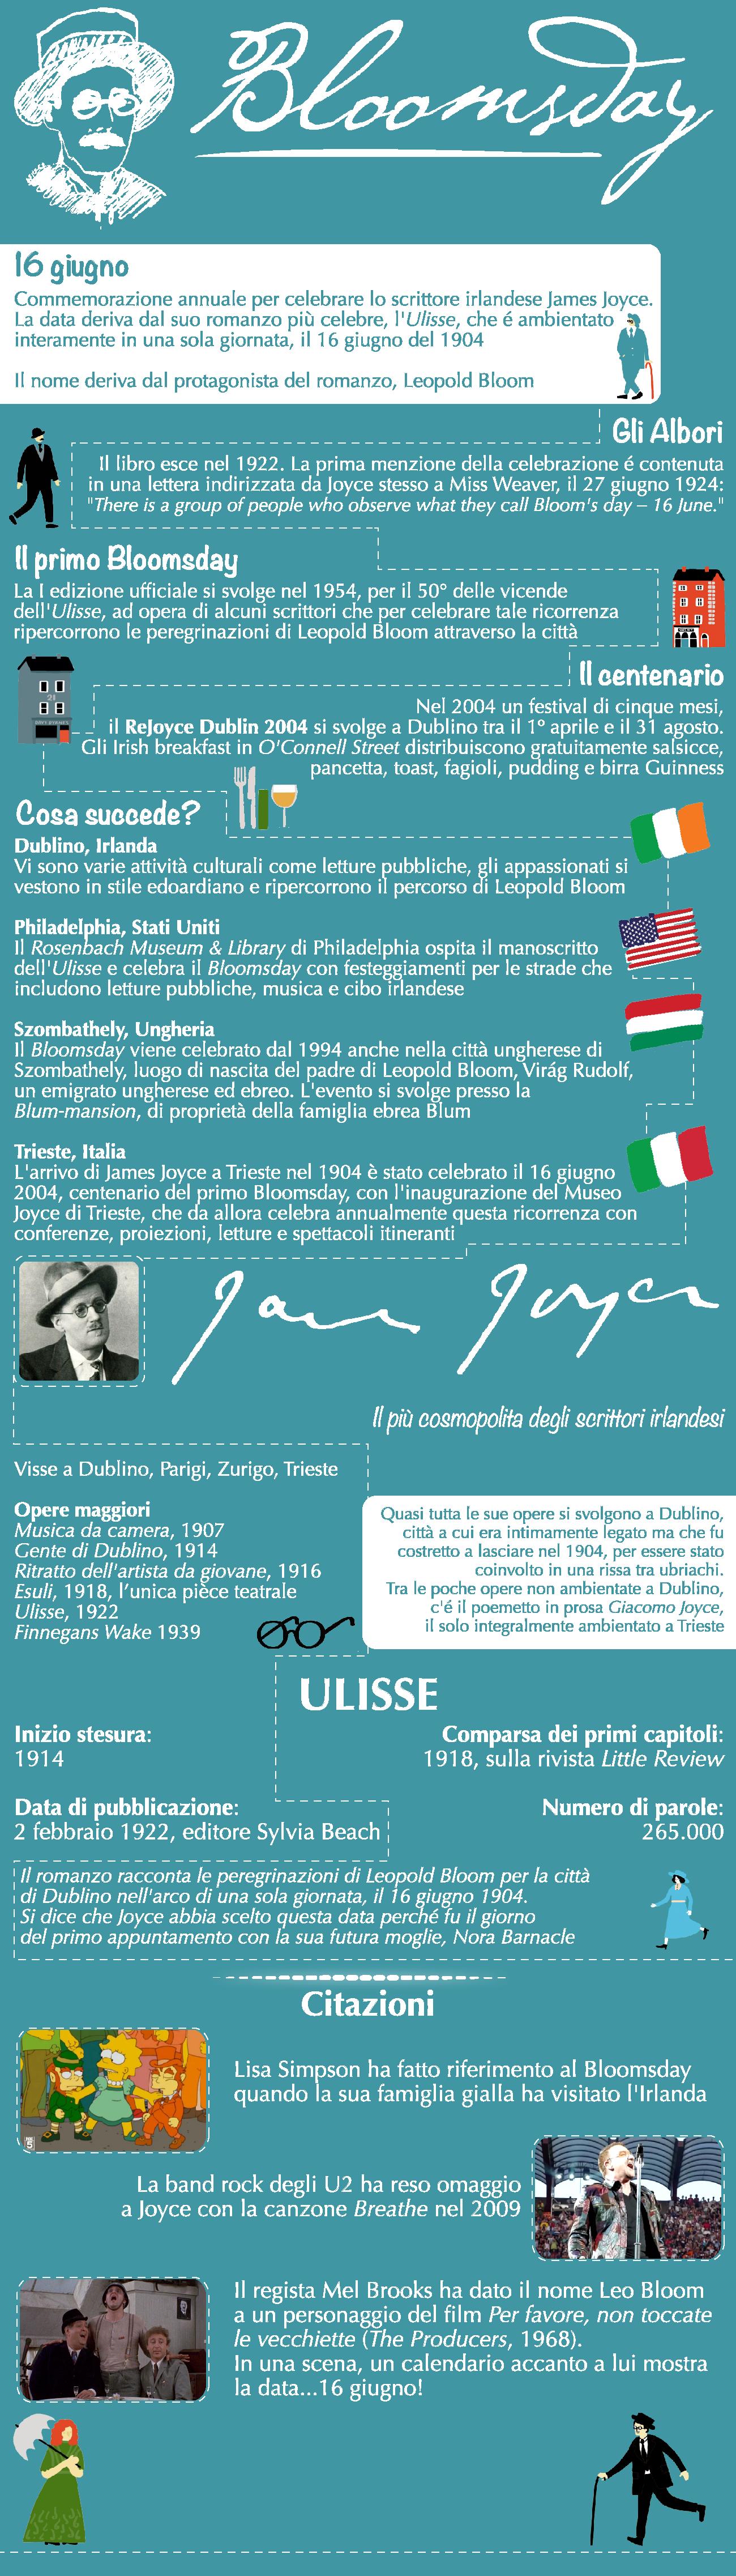 Bloomsday James Joyce